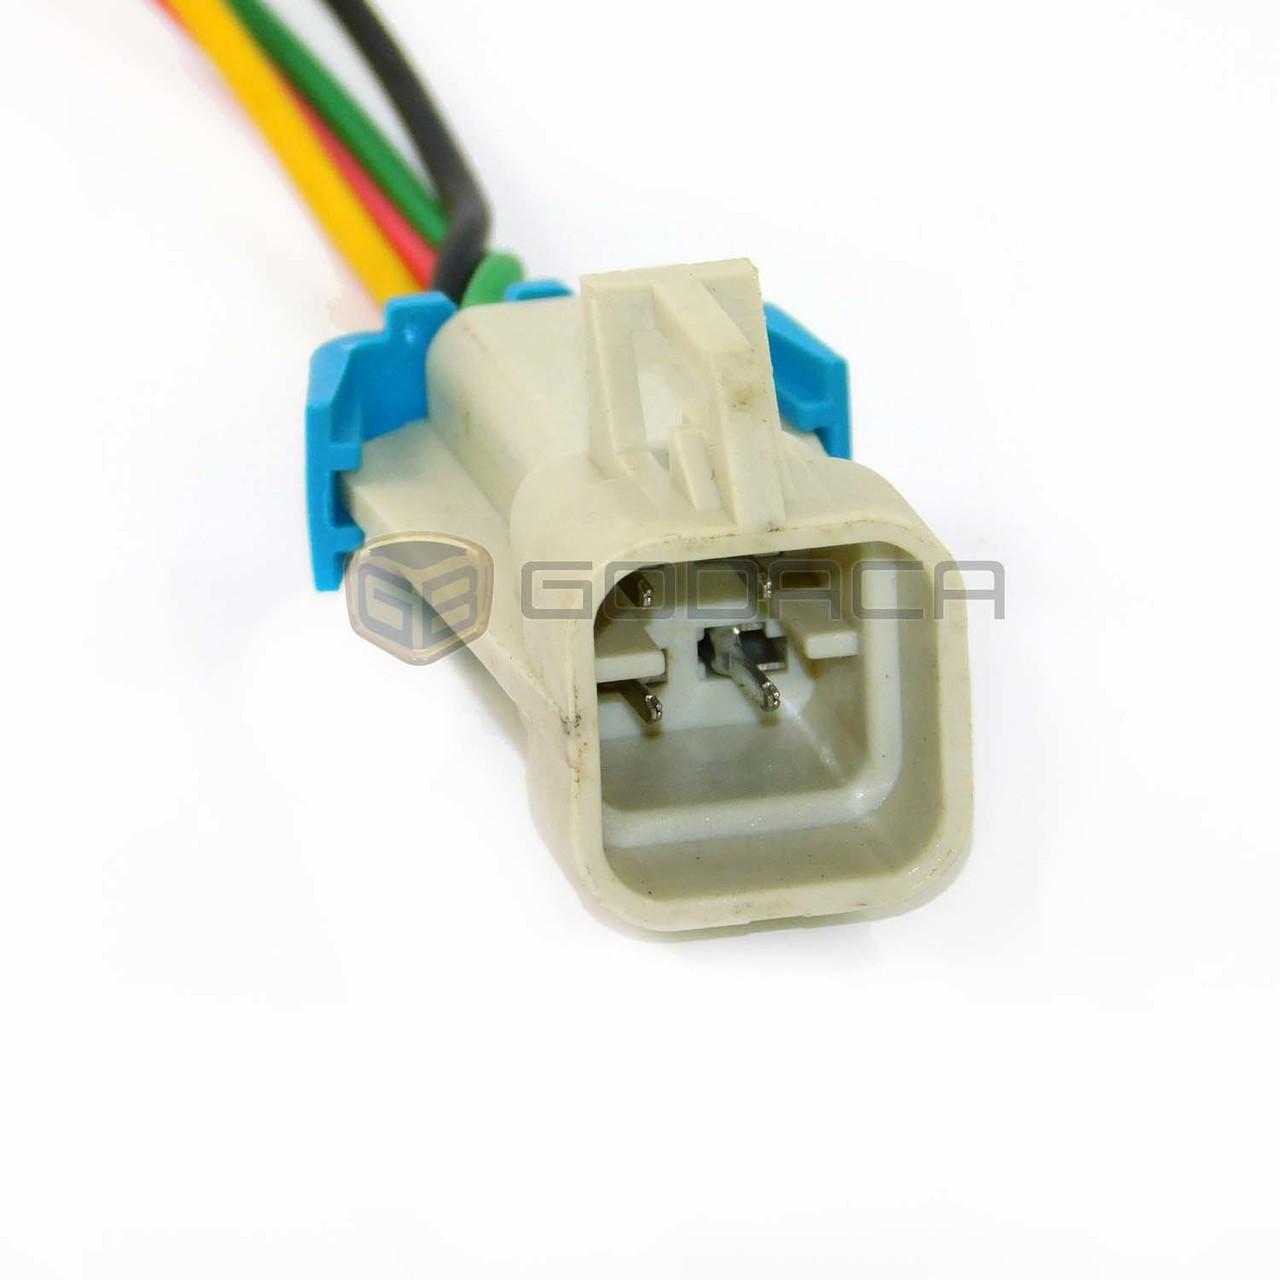 hight resolution of 1x 4 way repair connector for gm fuel pump oxygen sensor ls1 godaca llc